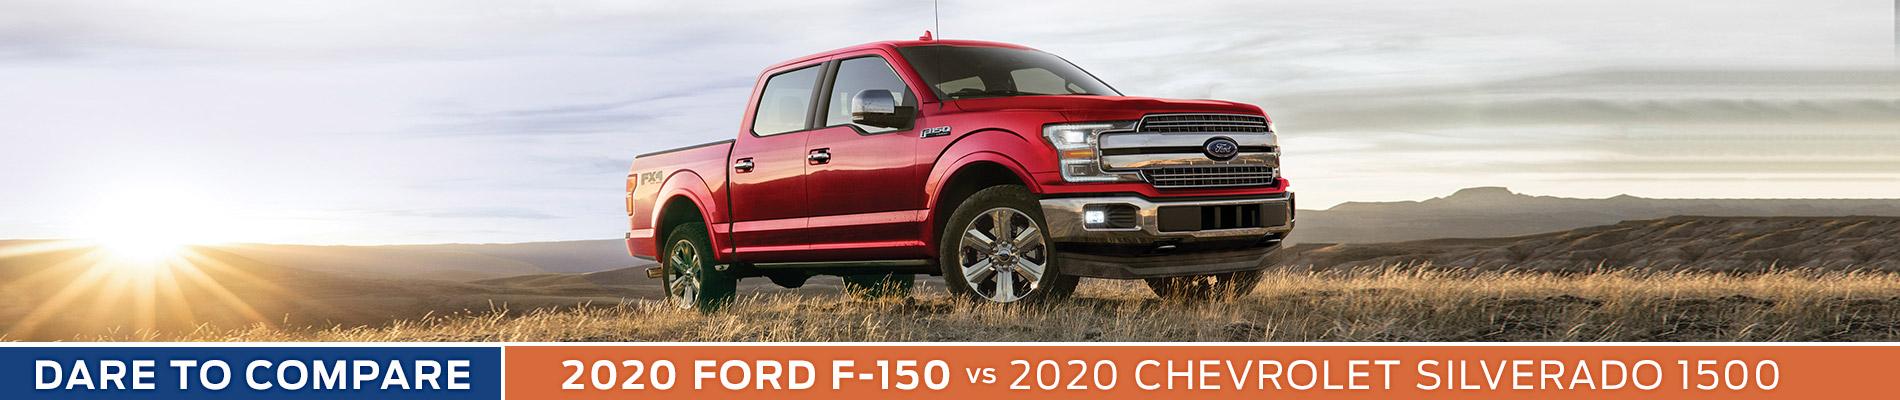 2020 Ford F-150 vs Chevy Silverado 1500 - Sun State Ford - Orlando, FL